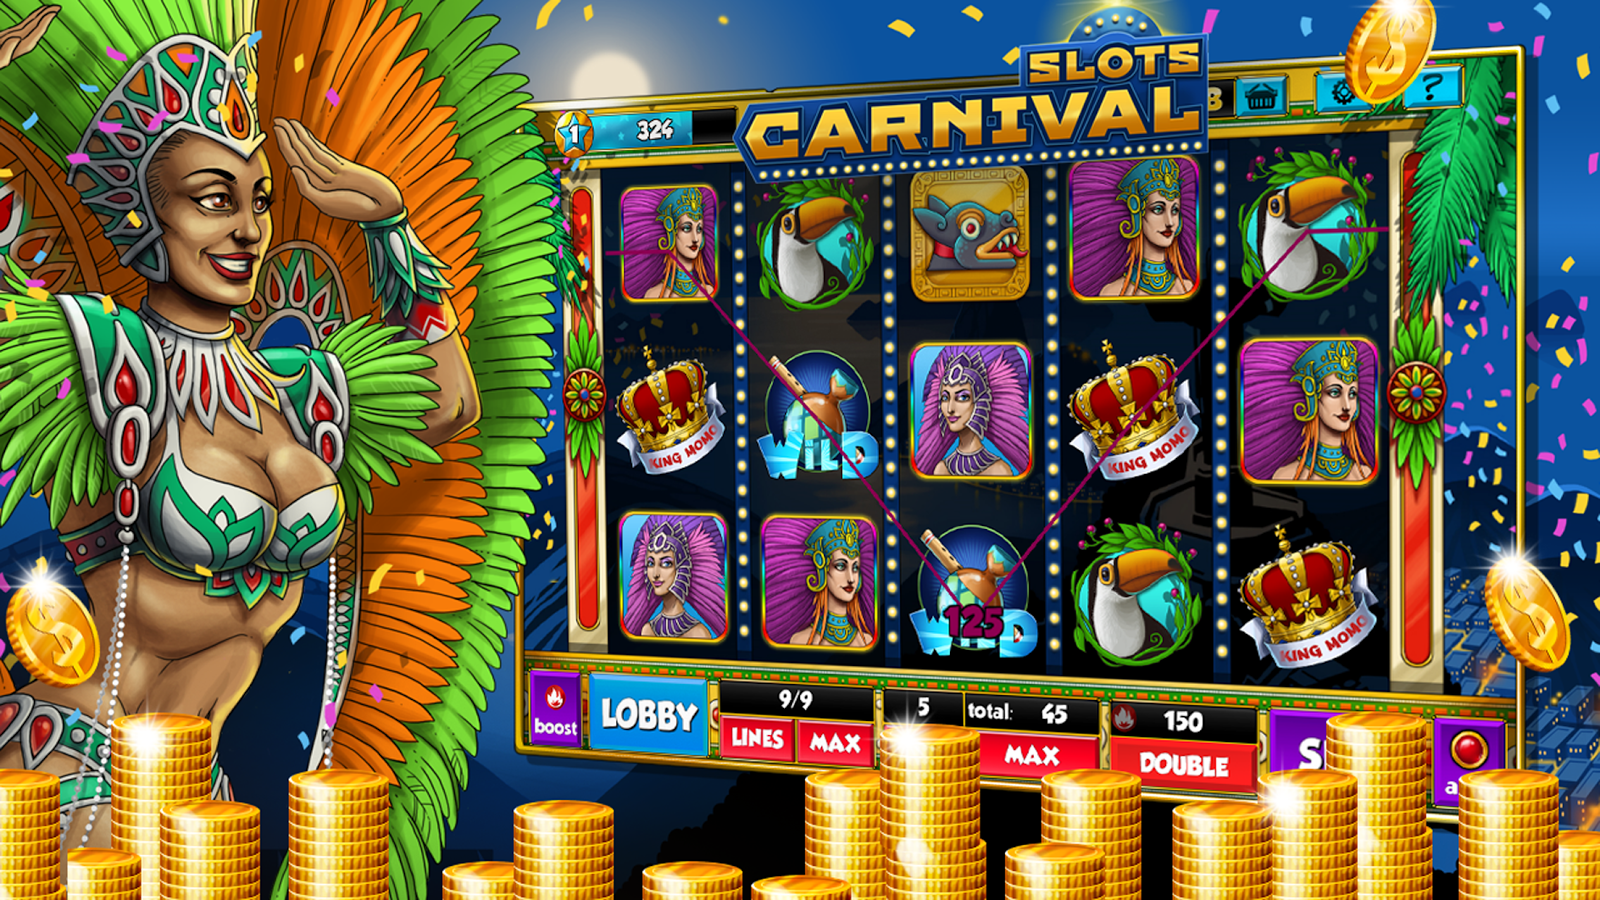 Slot game download pc